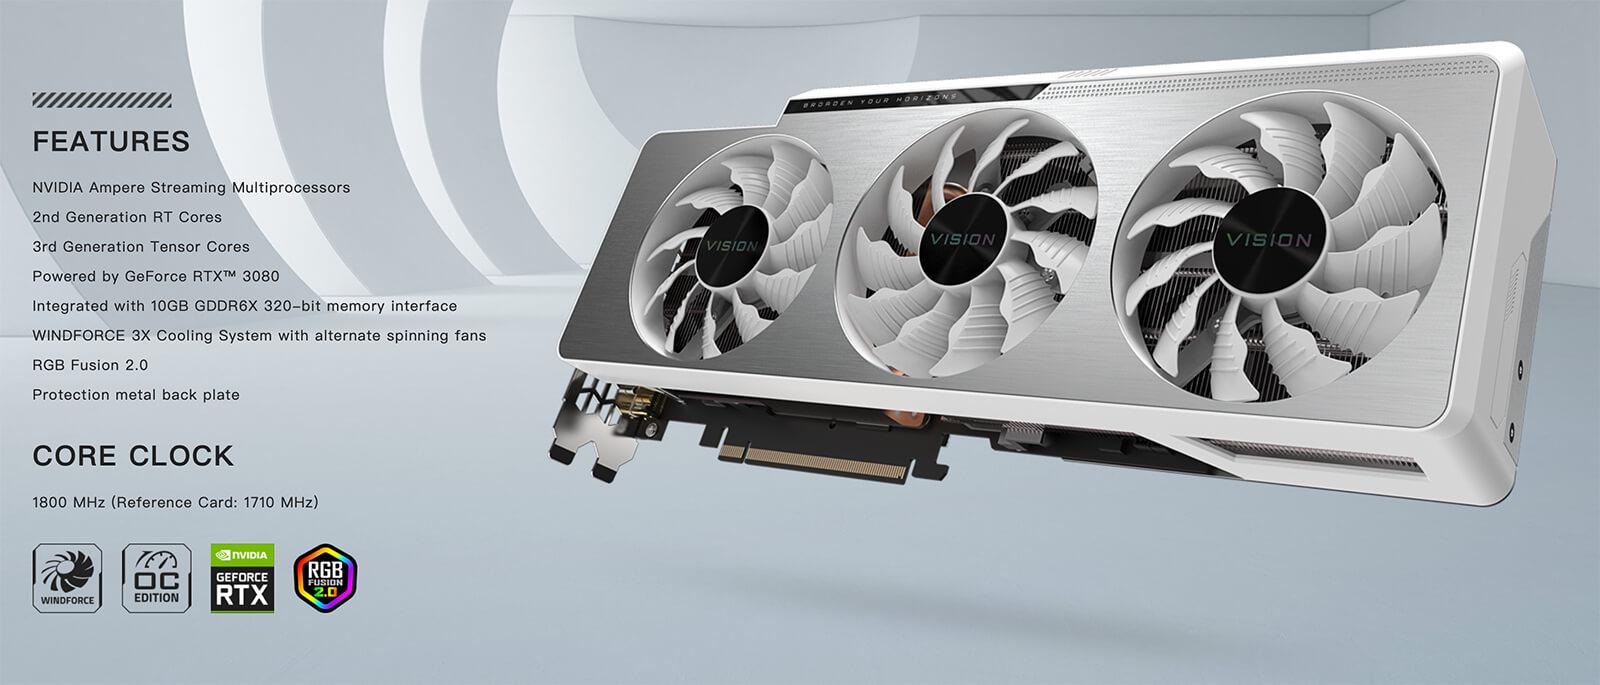 Gigabyte Geforce® Rtx 3080 Vision Oc 10g Keys Feature